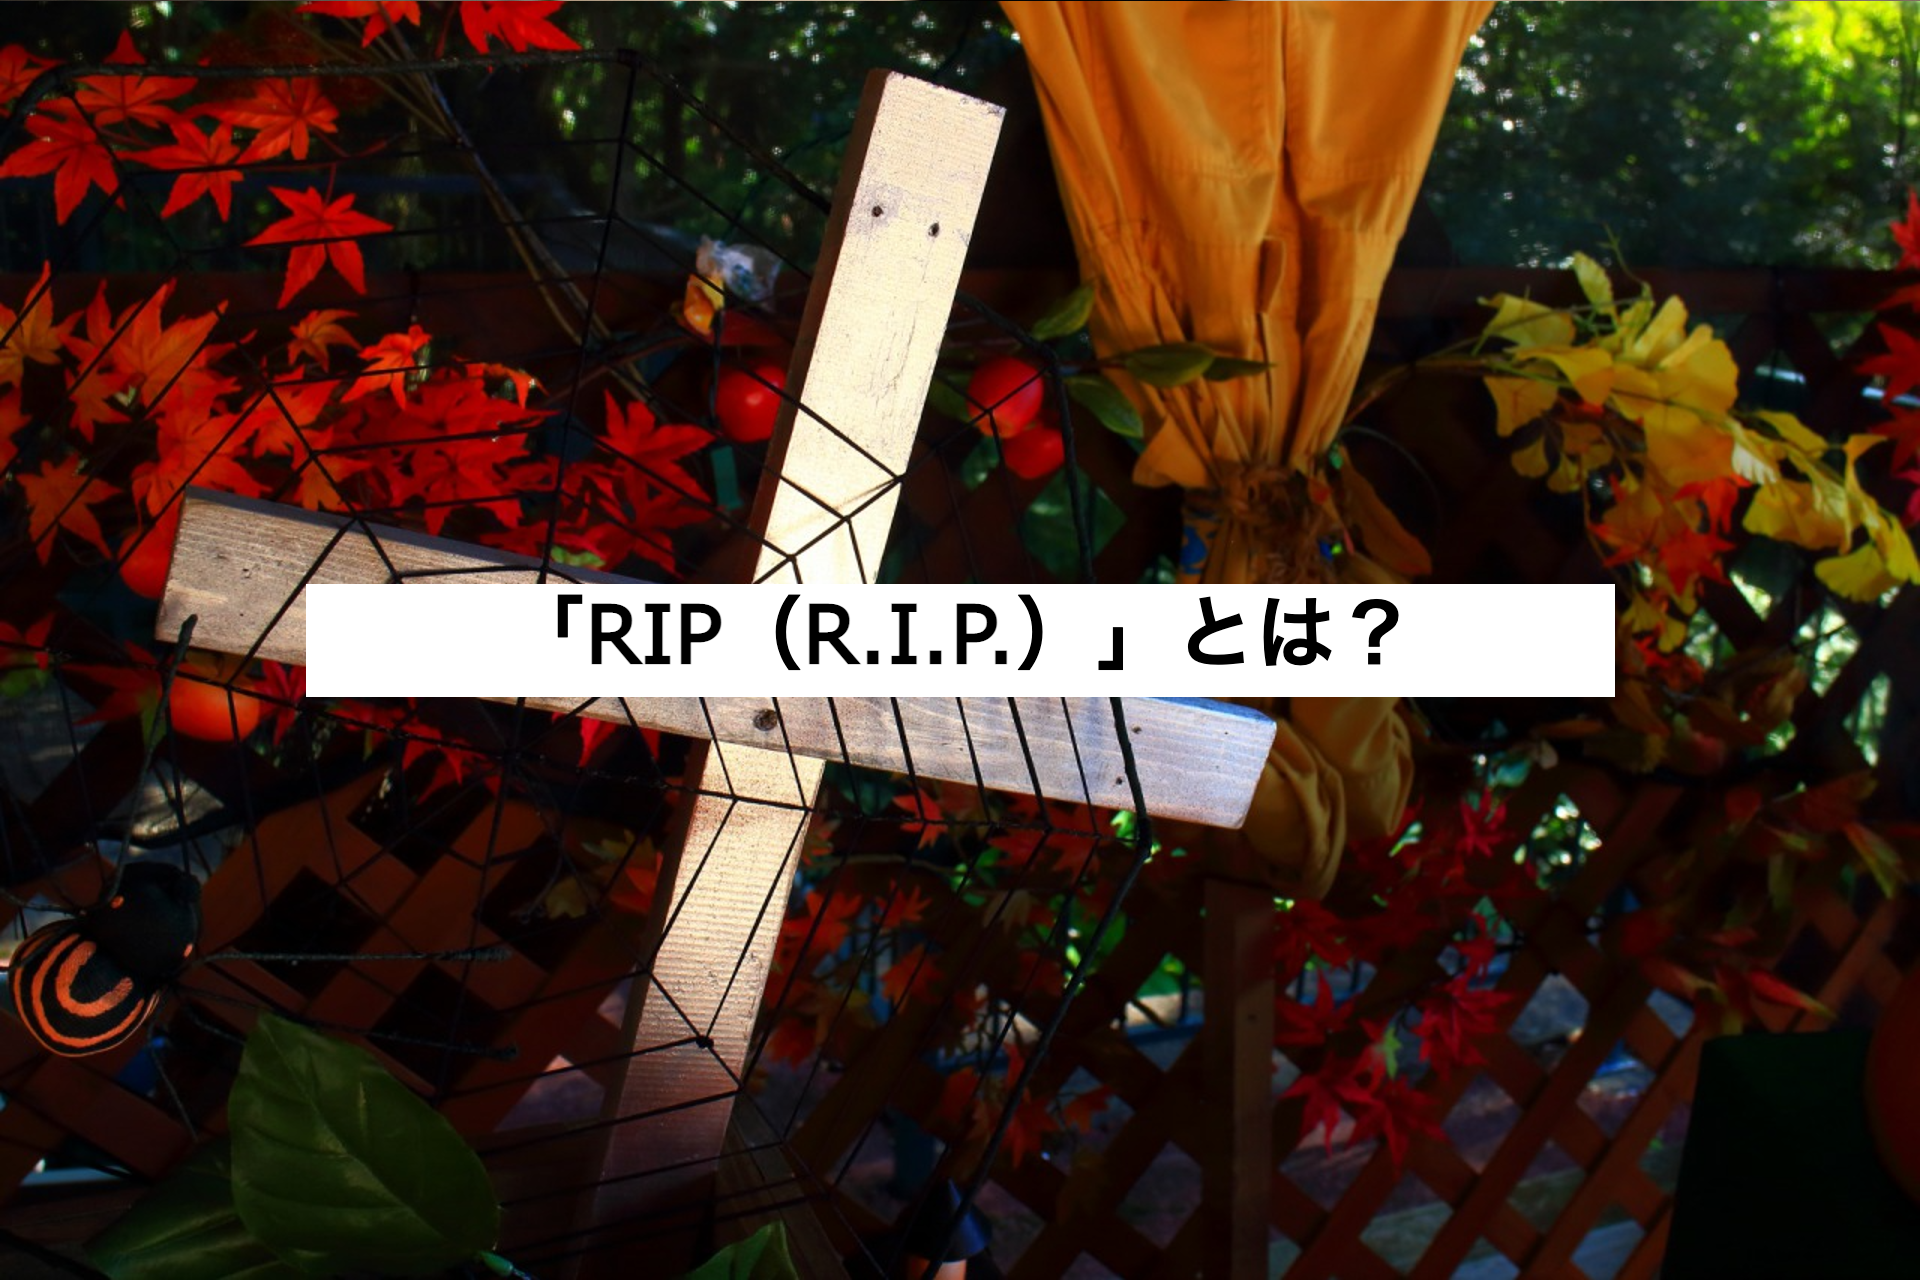 「RIP(R.I.P.)」とは?本来の意味とネット上での使い方例